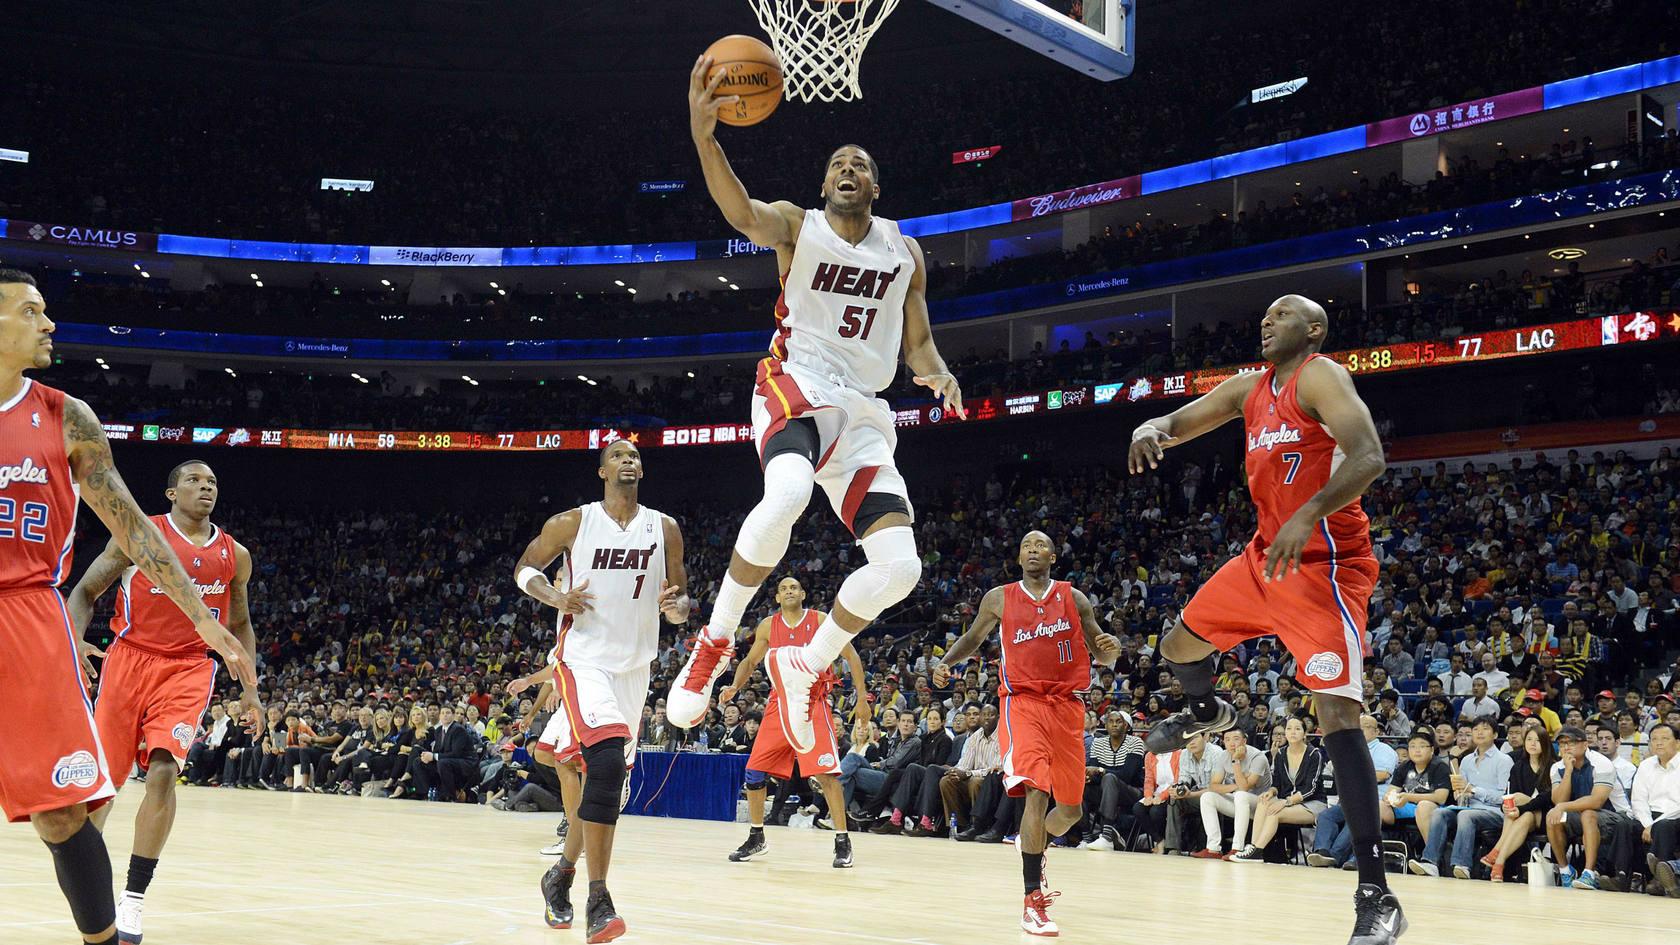 6012468fd La pretemporada de la NBA